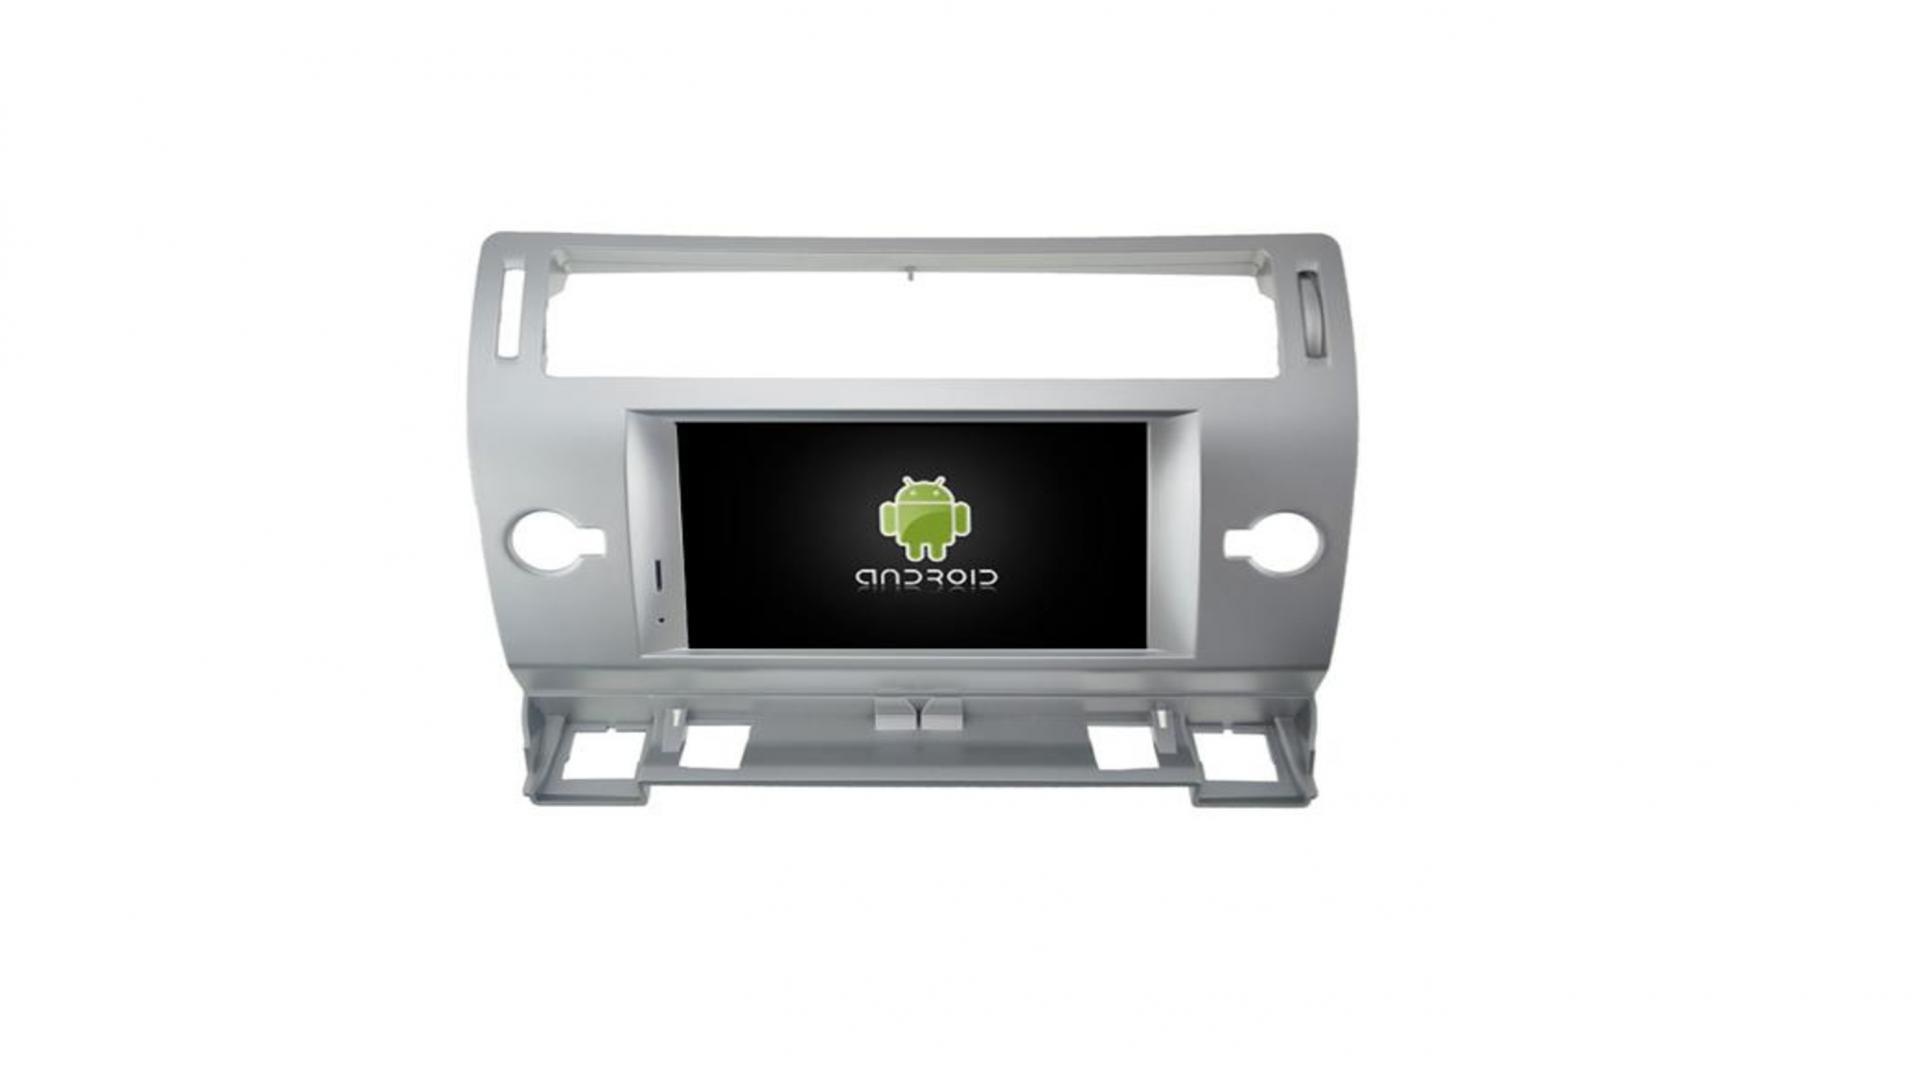 C4 citroen c4 autoradio gps bluetooth android auto carplay camera de recul commande au volant1